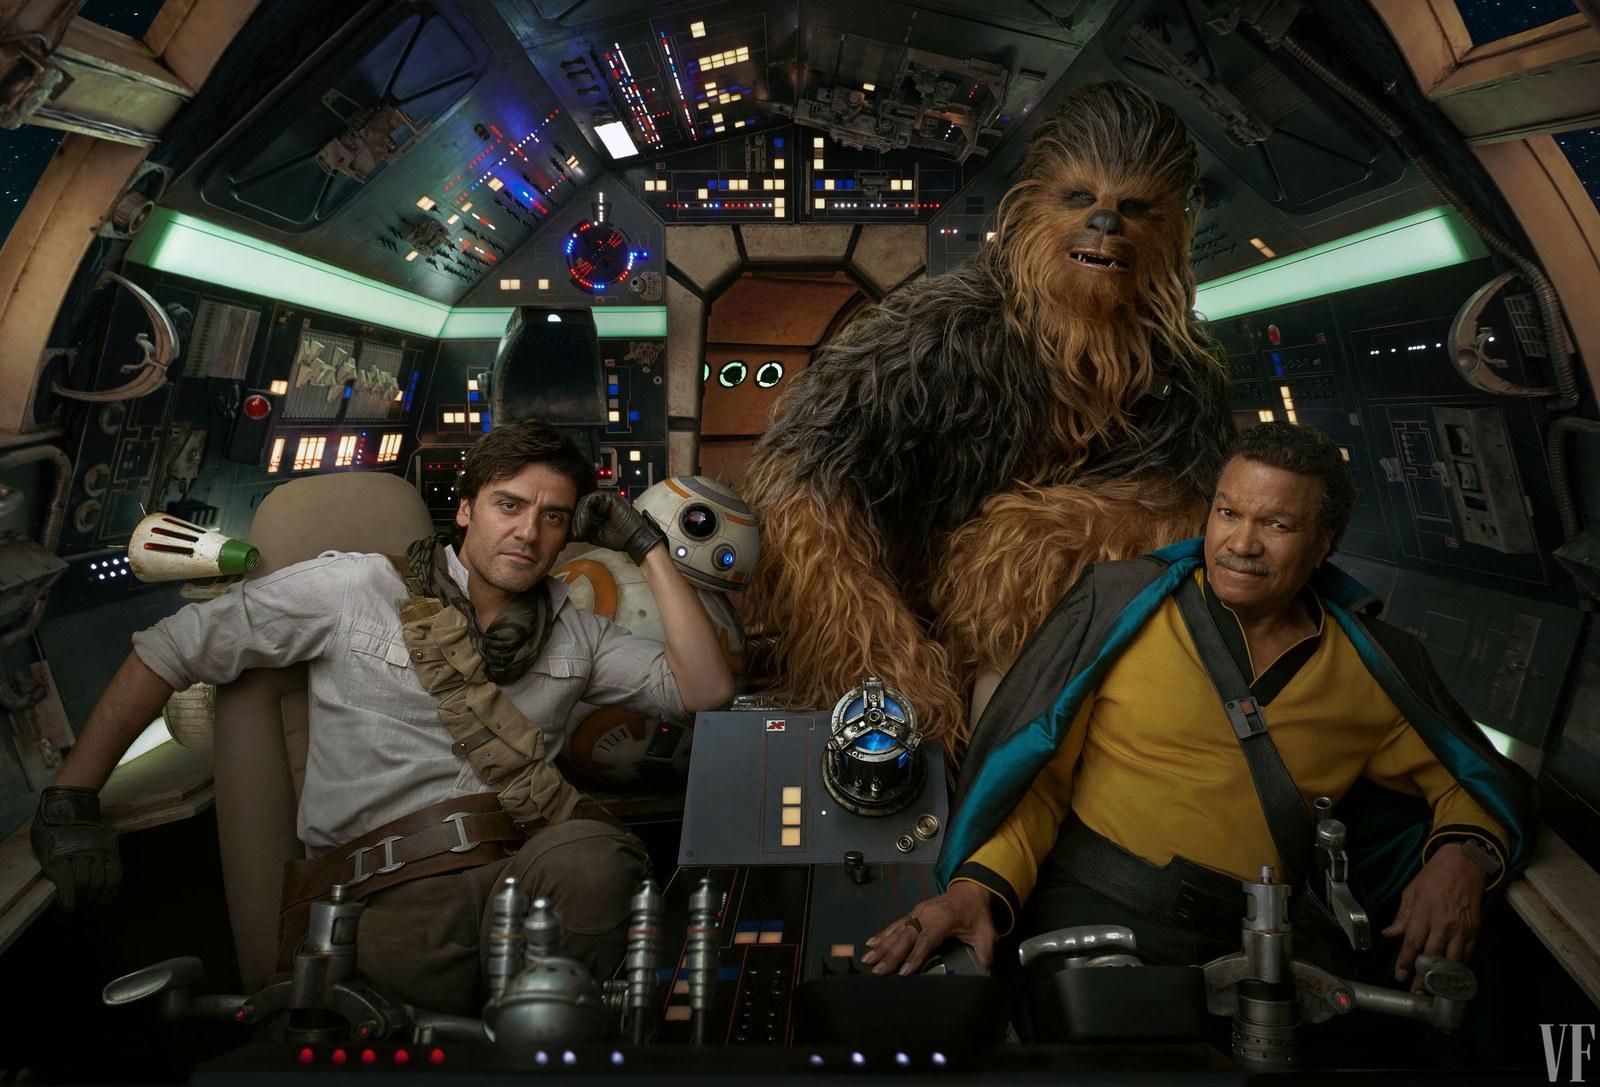 star-wars-feature-vf-2019-summer-embed-07.jpg